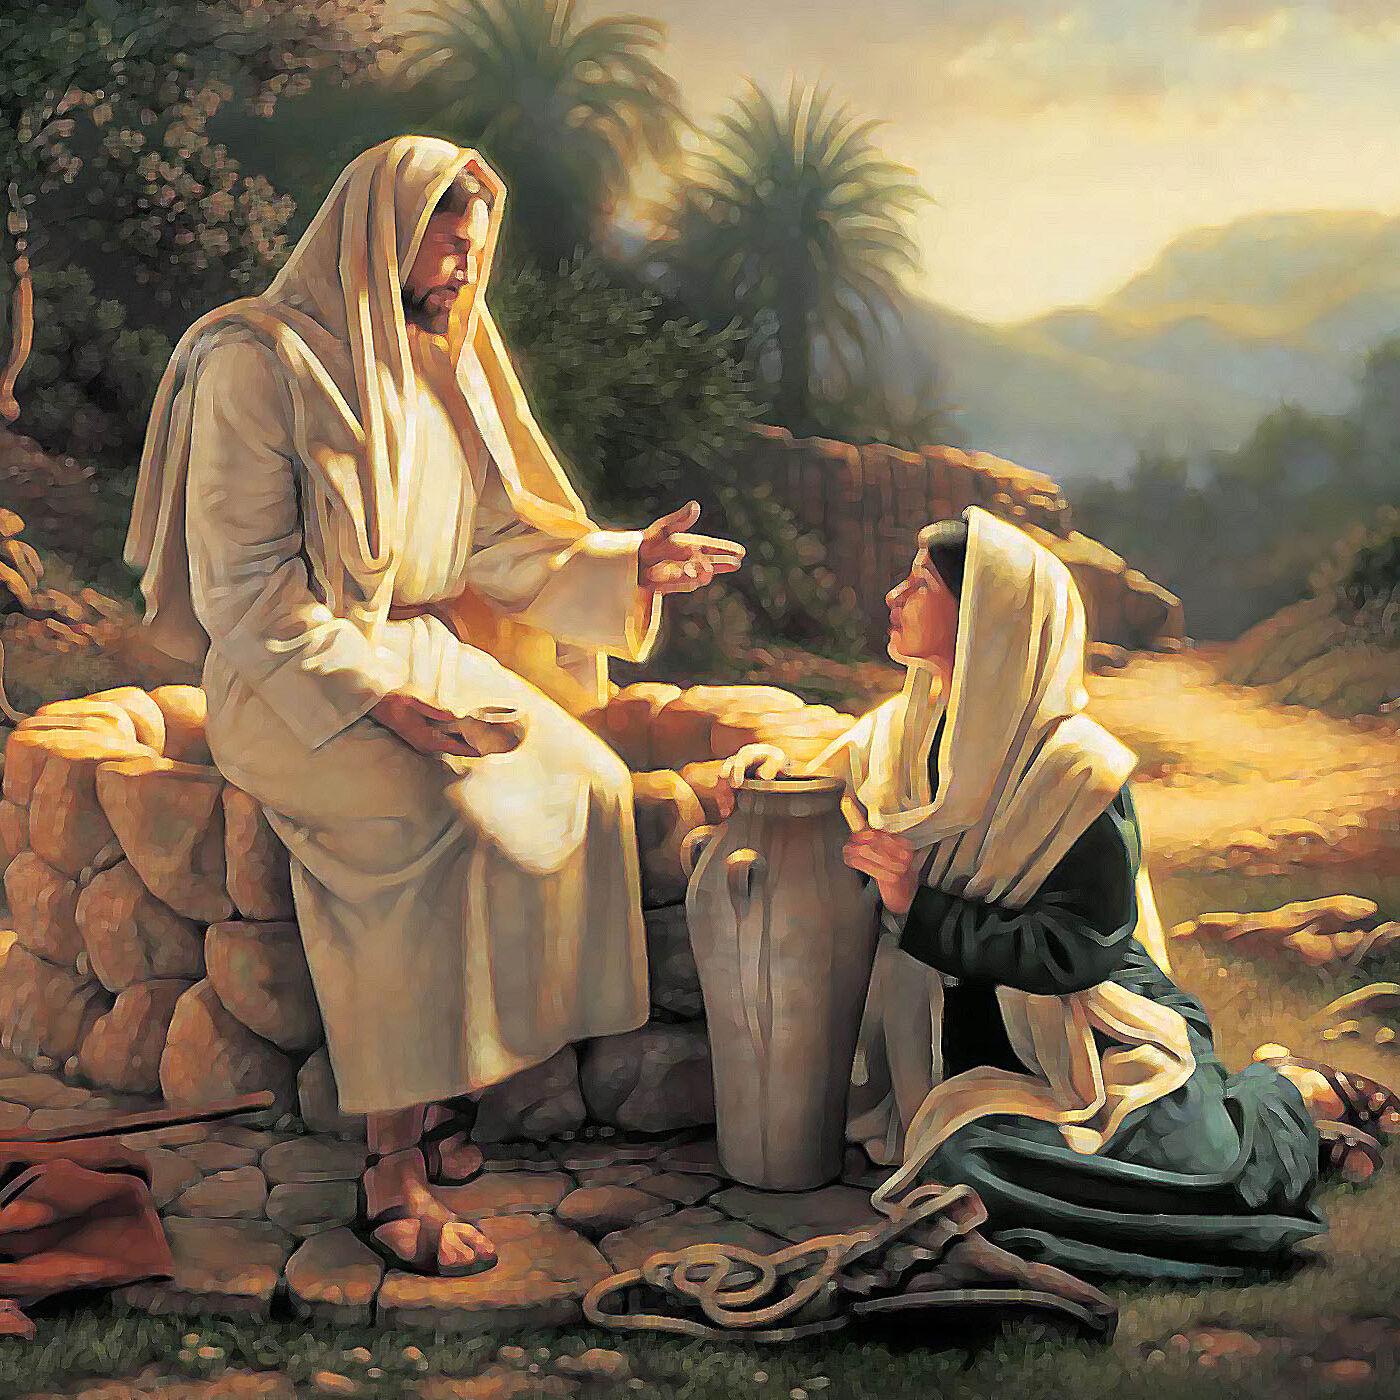 riflessioni sul Vangelo di Sabato 9 Gennaio 2021 (Mc 6, 45-52) - Apostola Simona